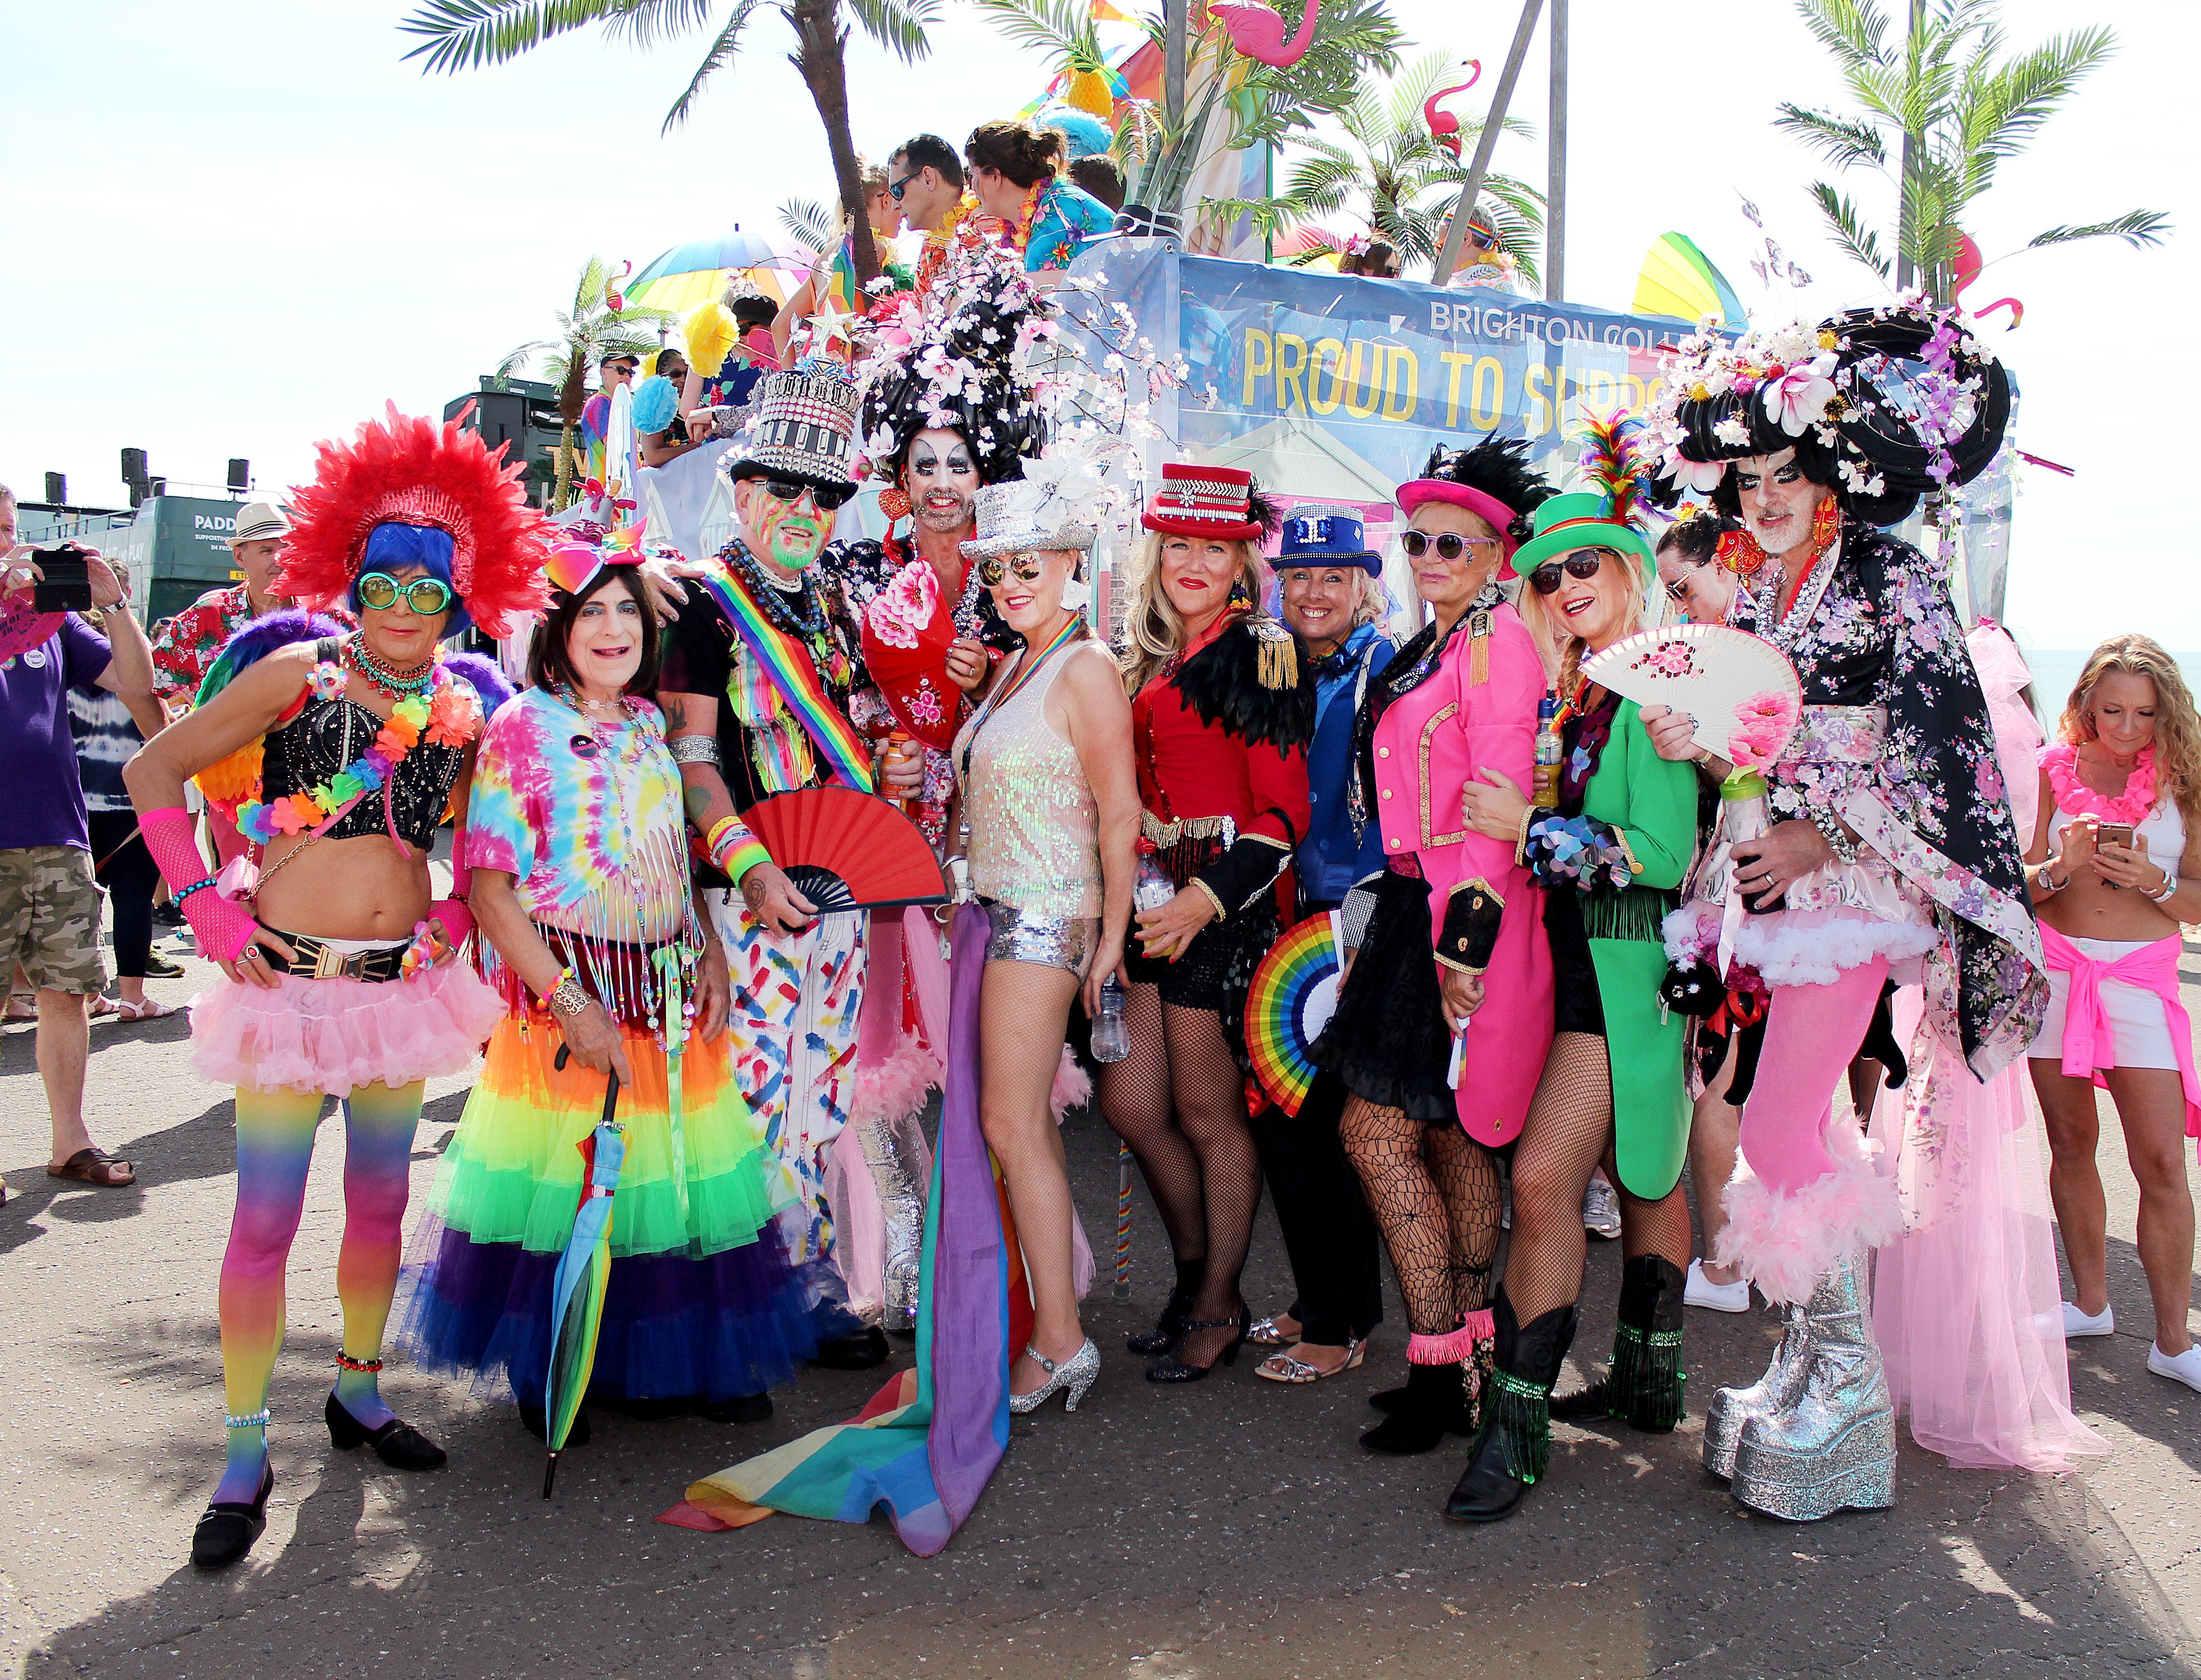 Brighton Pride 2018 raise record £250,000 for good causes